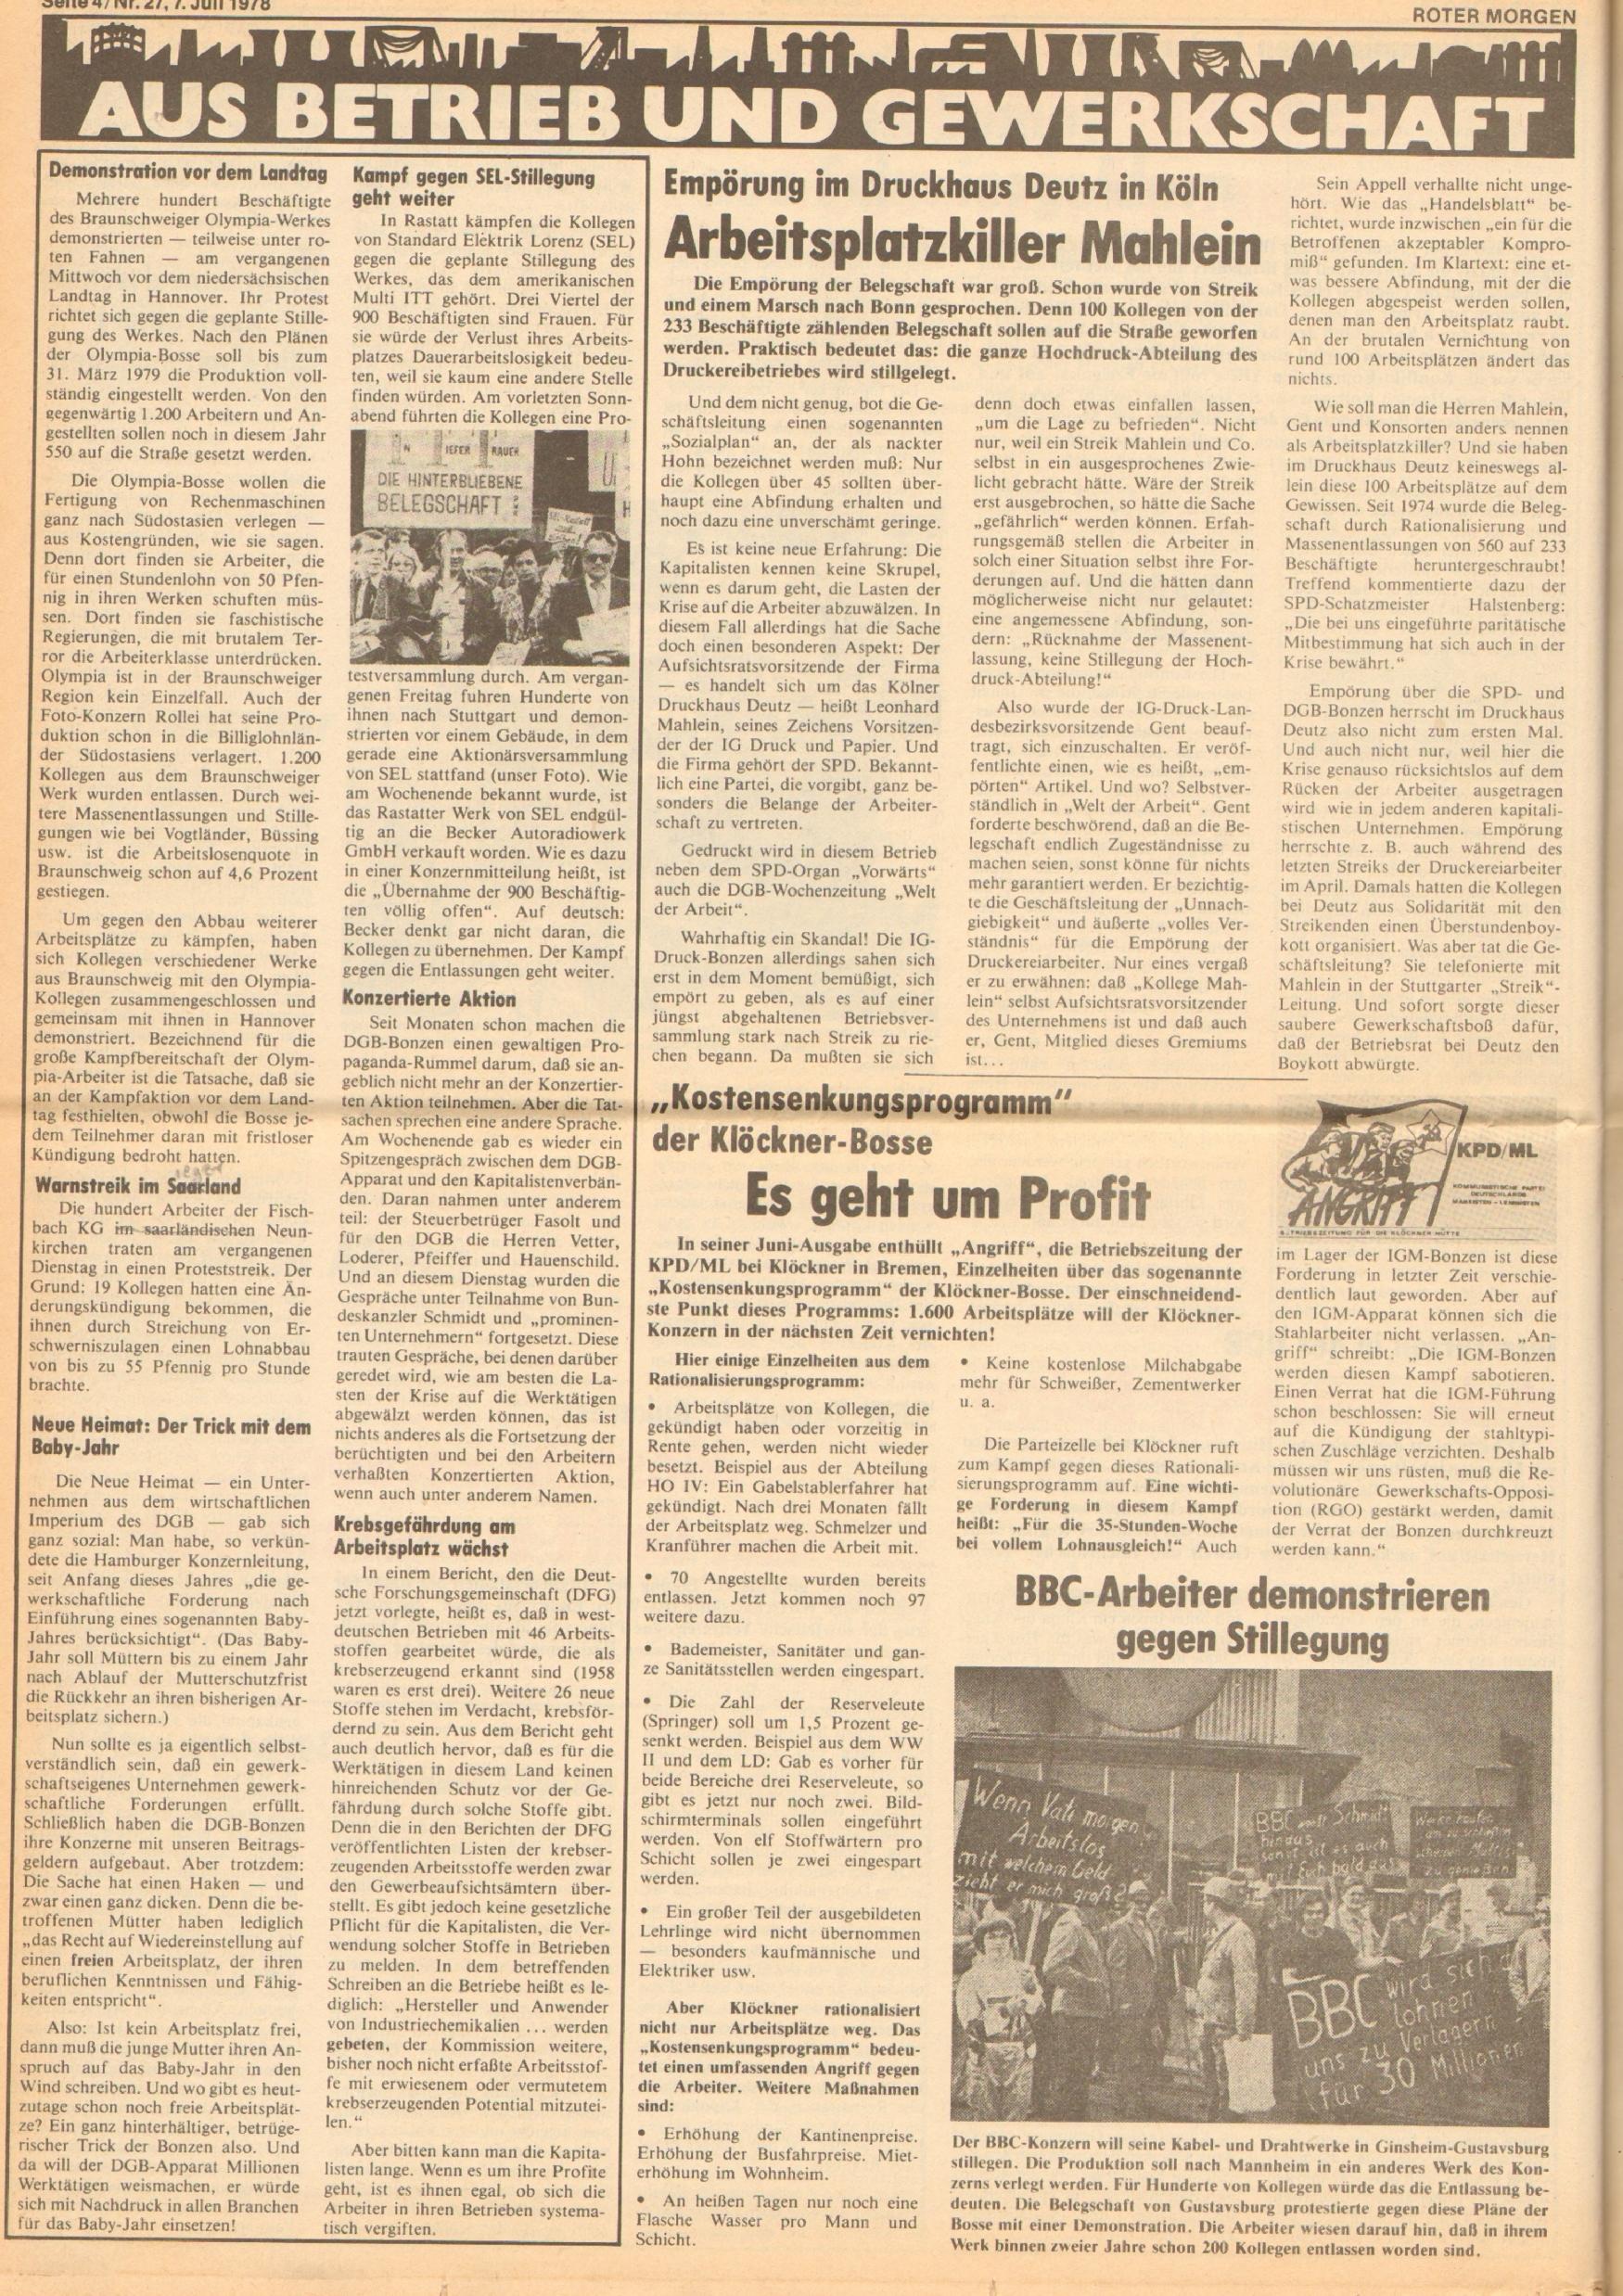 Roter Morgen, 12. Jg., 7. Juli 1978, Nr. 27, Seite 4